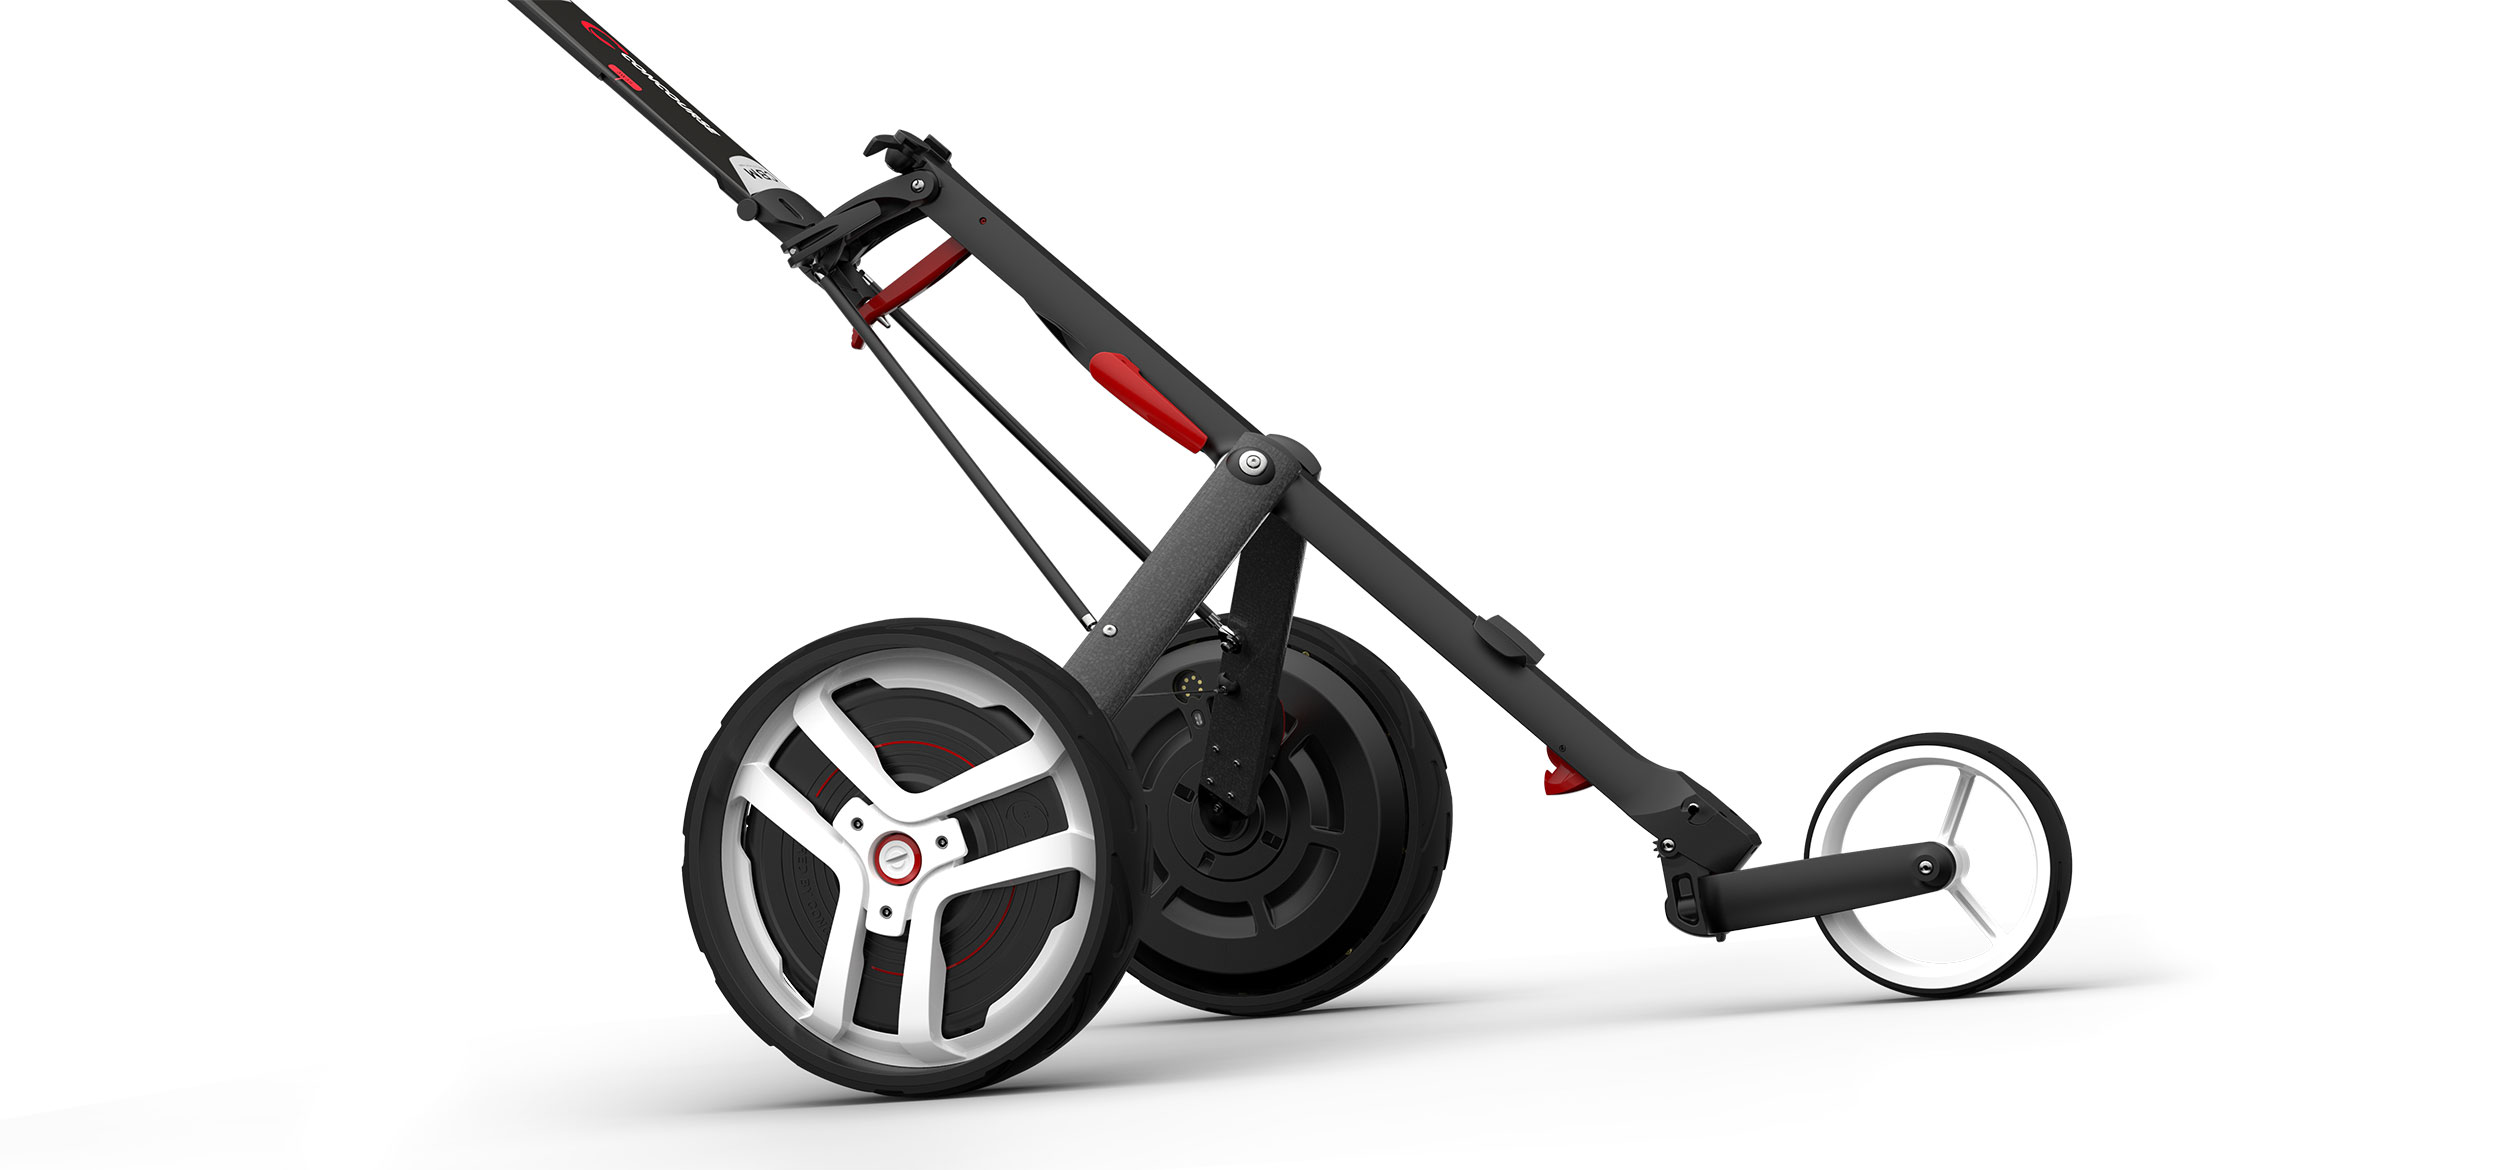 Concourse Smart Wheels